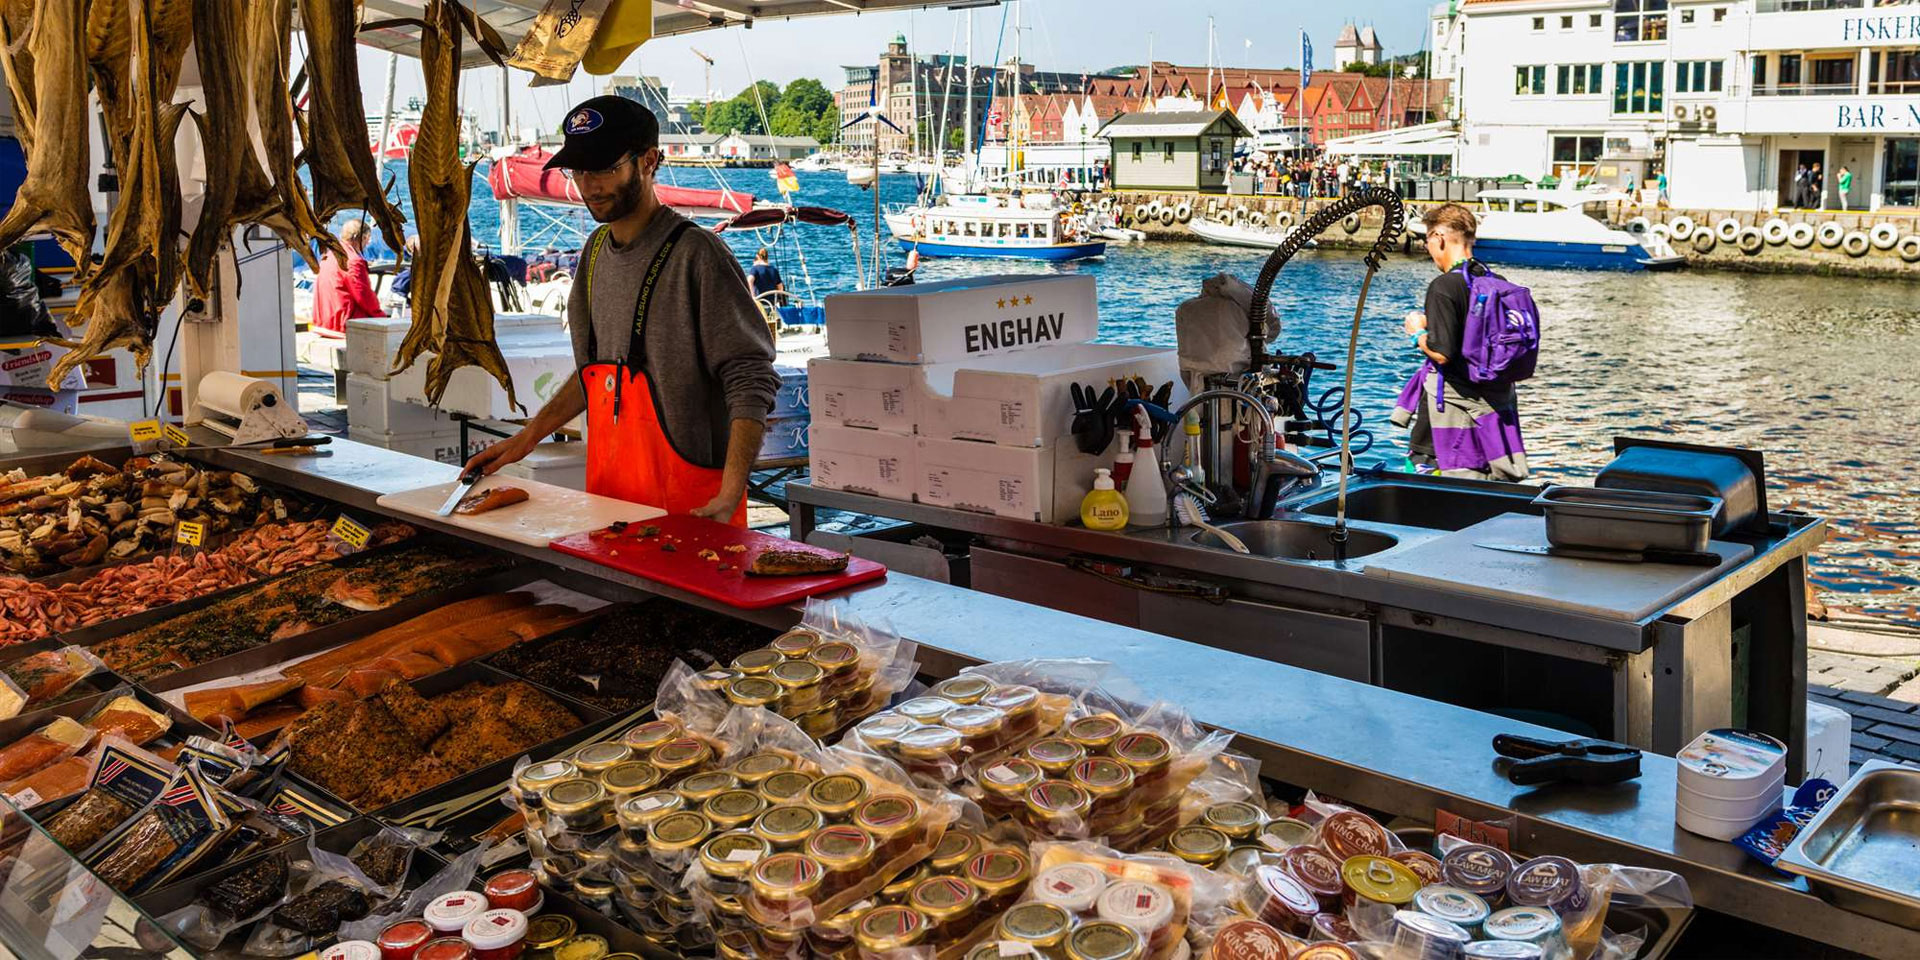 2019, bergen, fish market